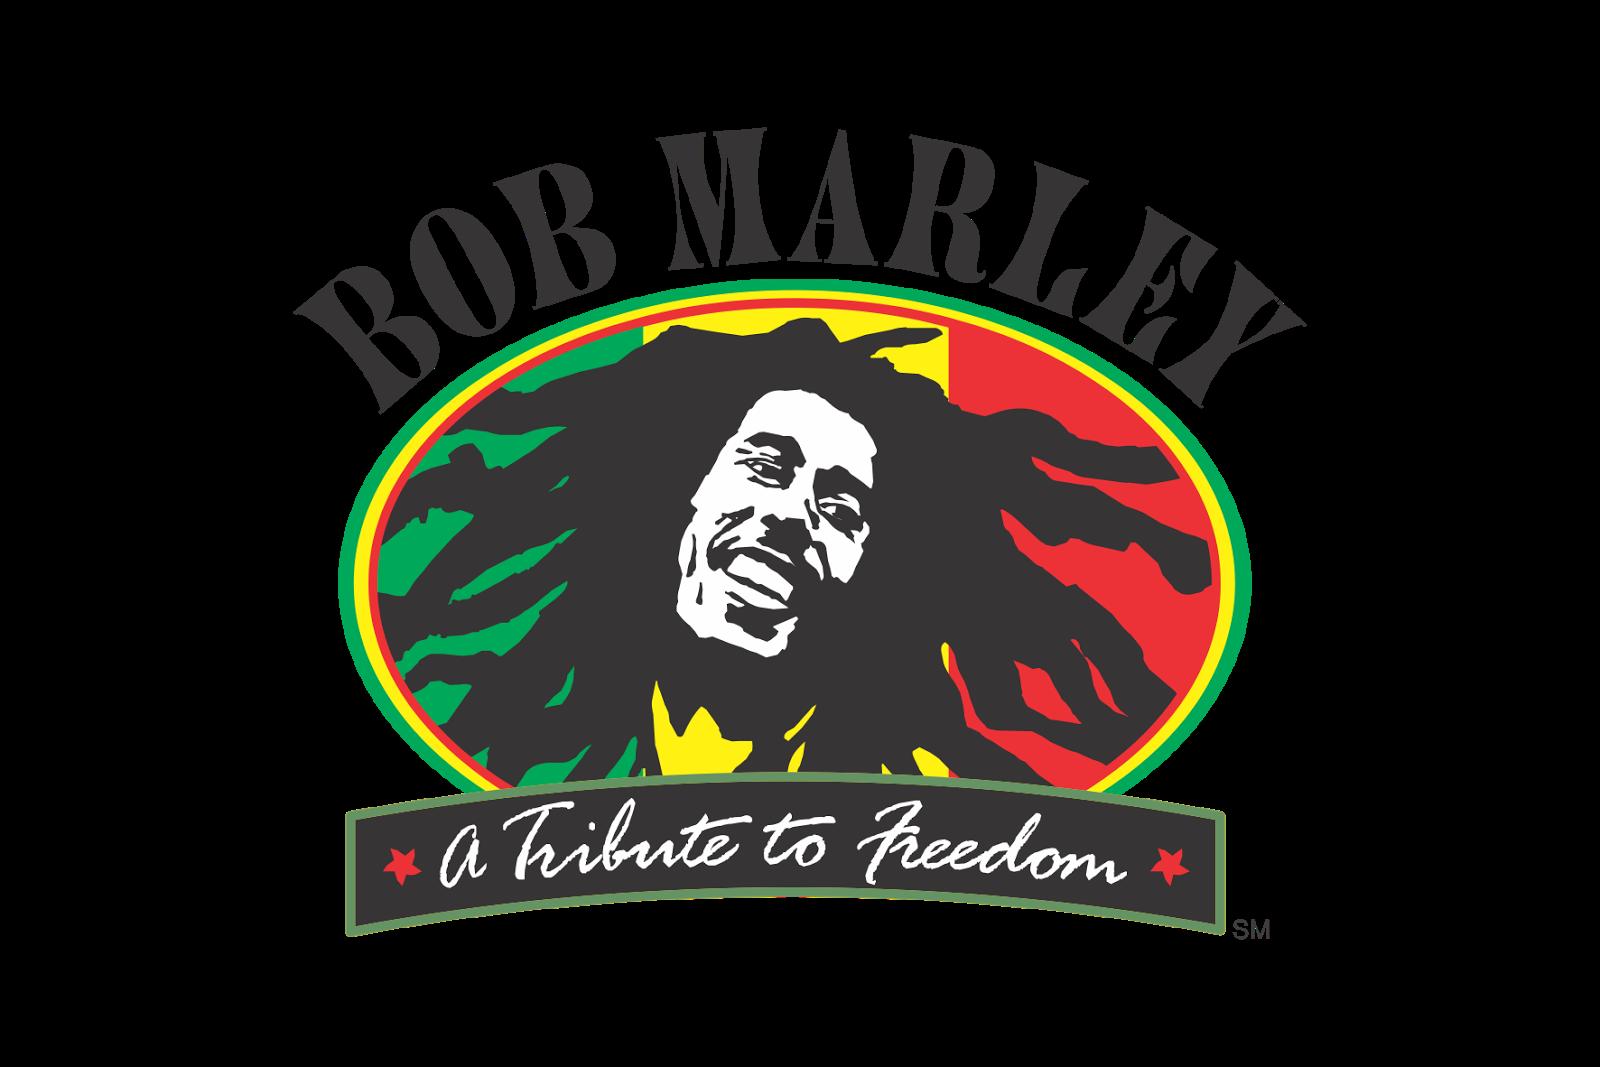 Bob Marley PNG Images Transparent Free Download.